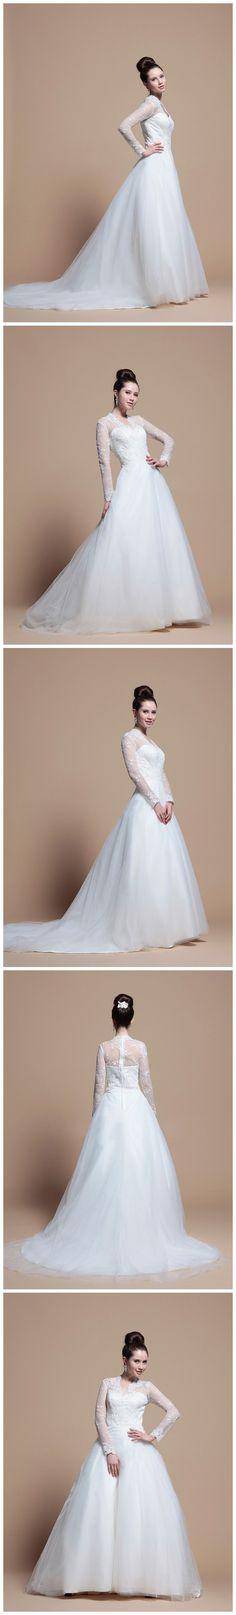 Princess Long Sleeve V-Neck Wedding Dress